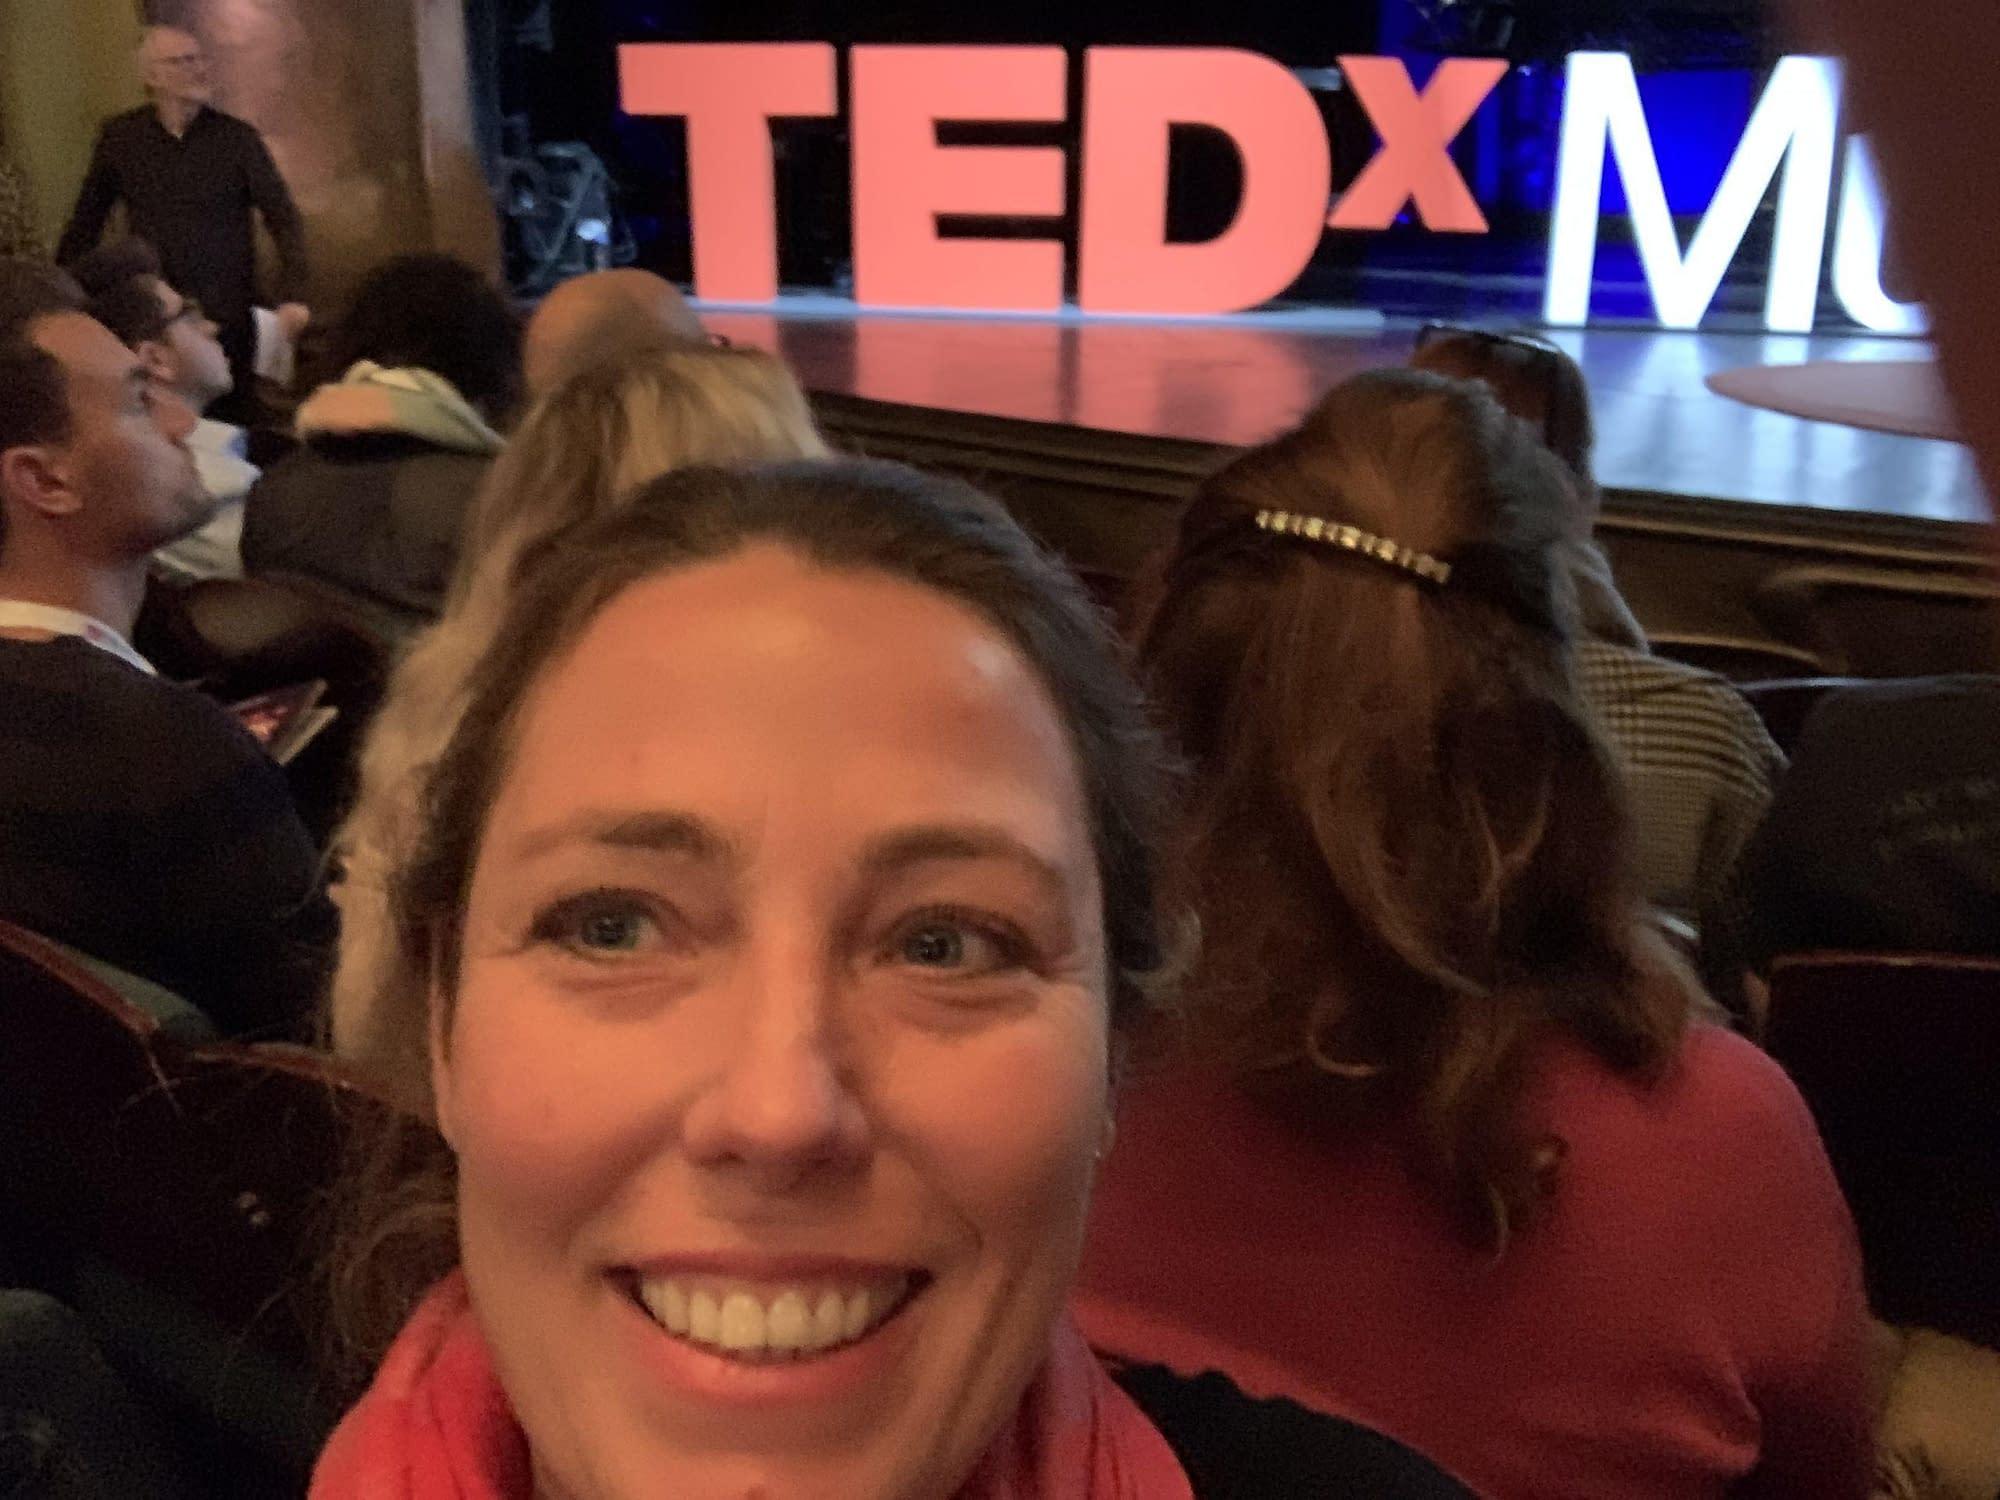 tedx 1 scaled Christina Teuthorn-Mohr